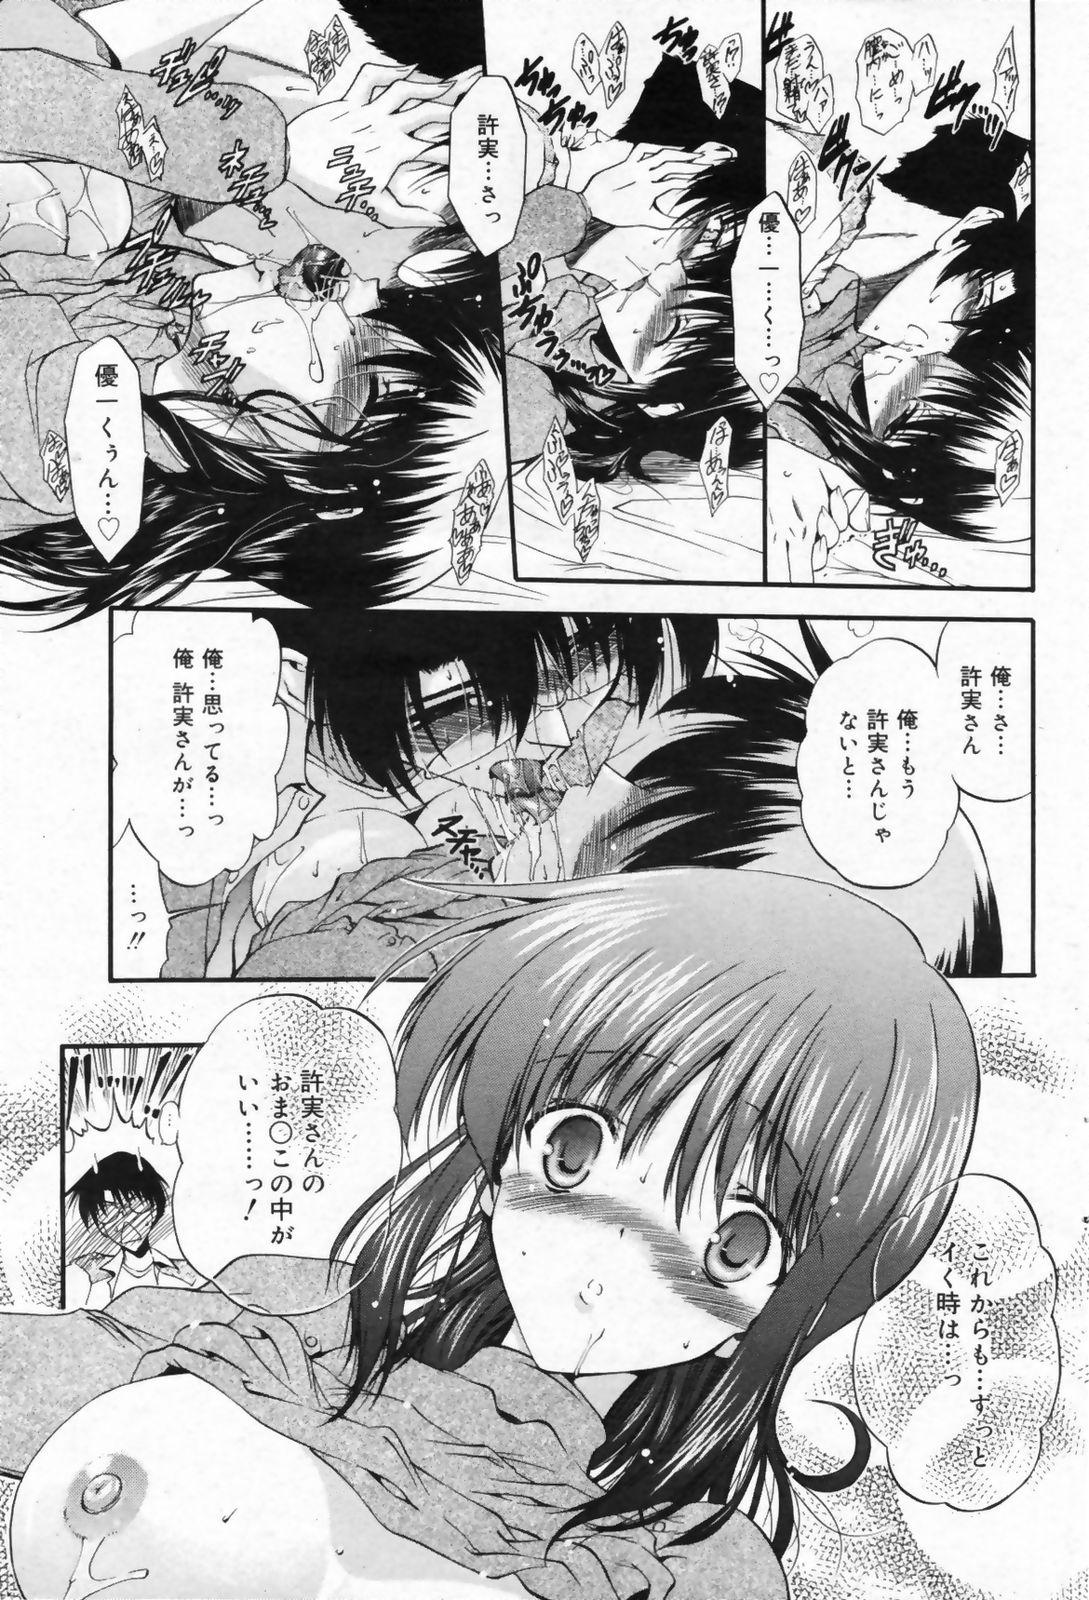 Manga Bangaichi 2009-02 Vol. 234 92